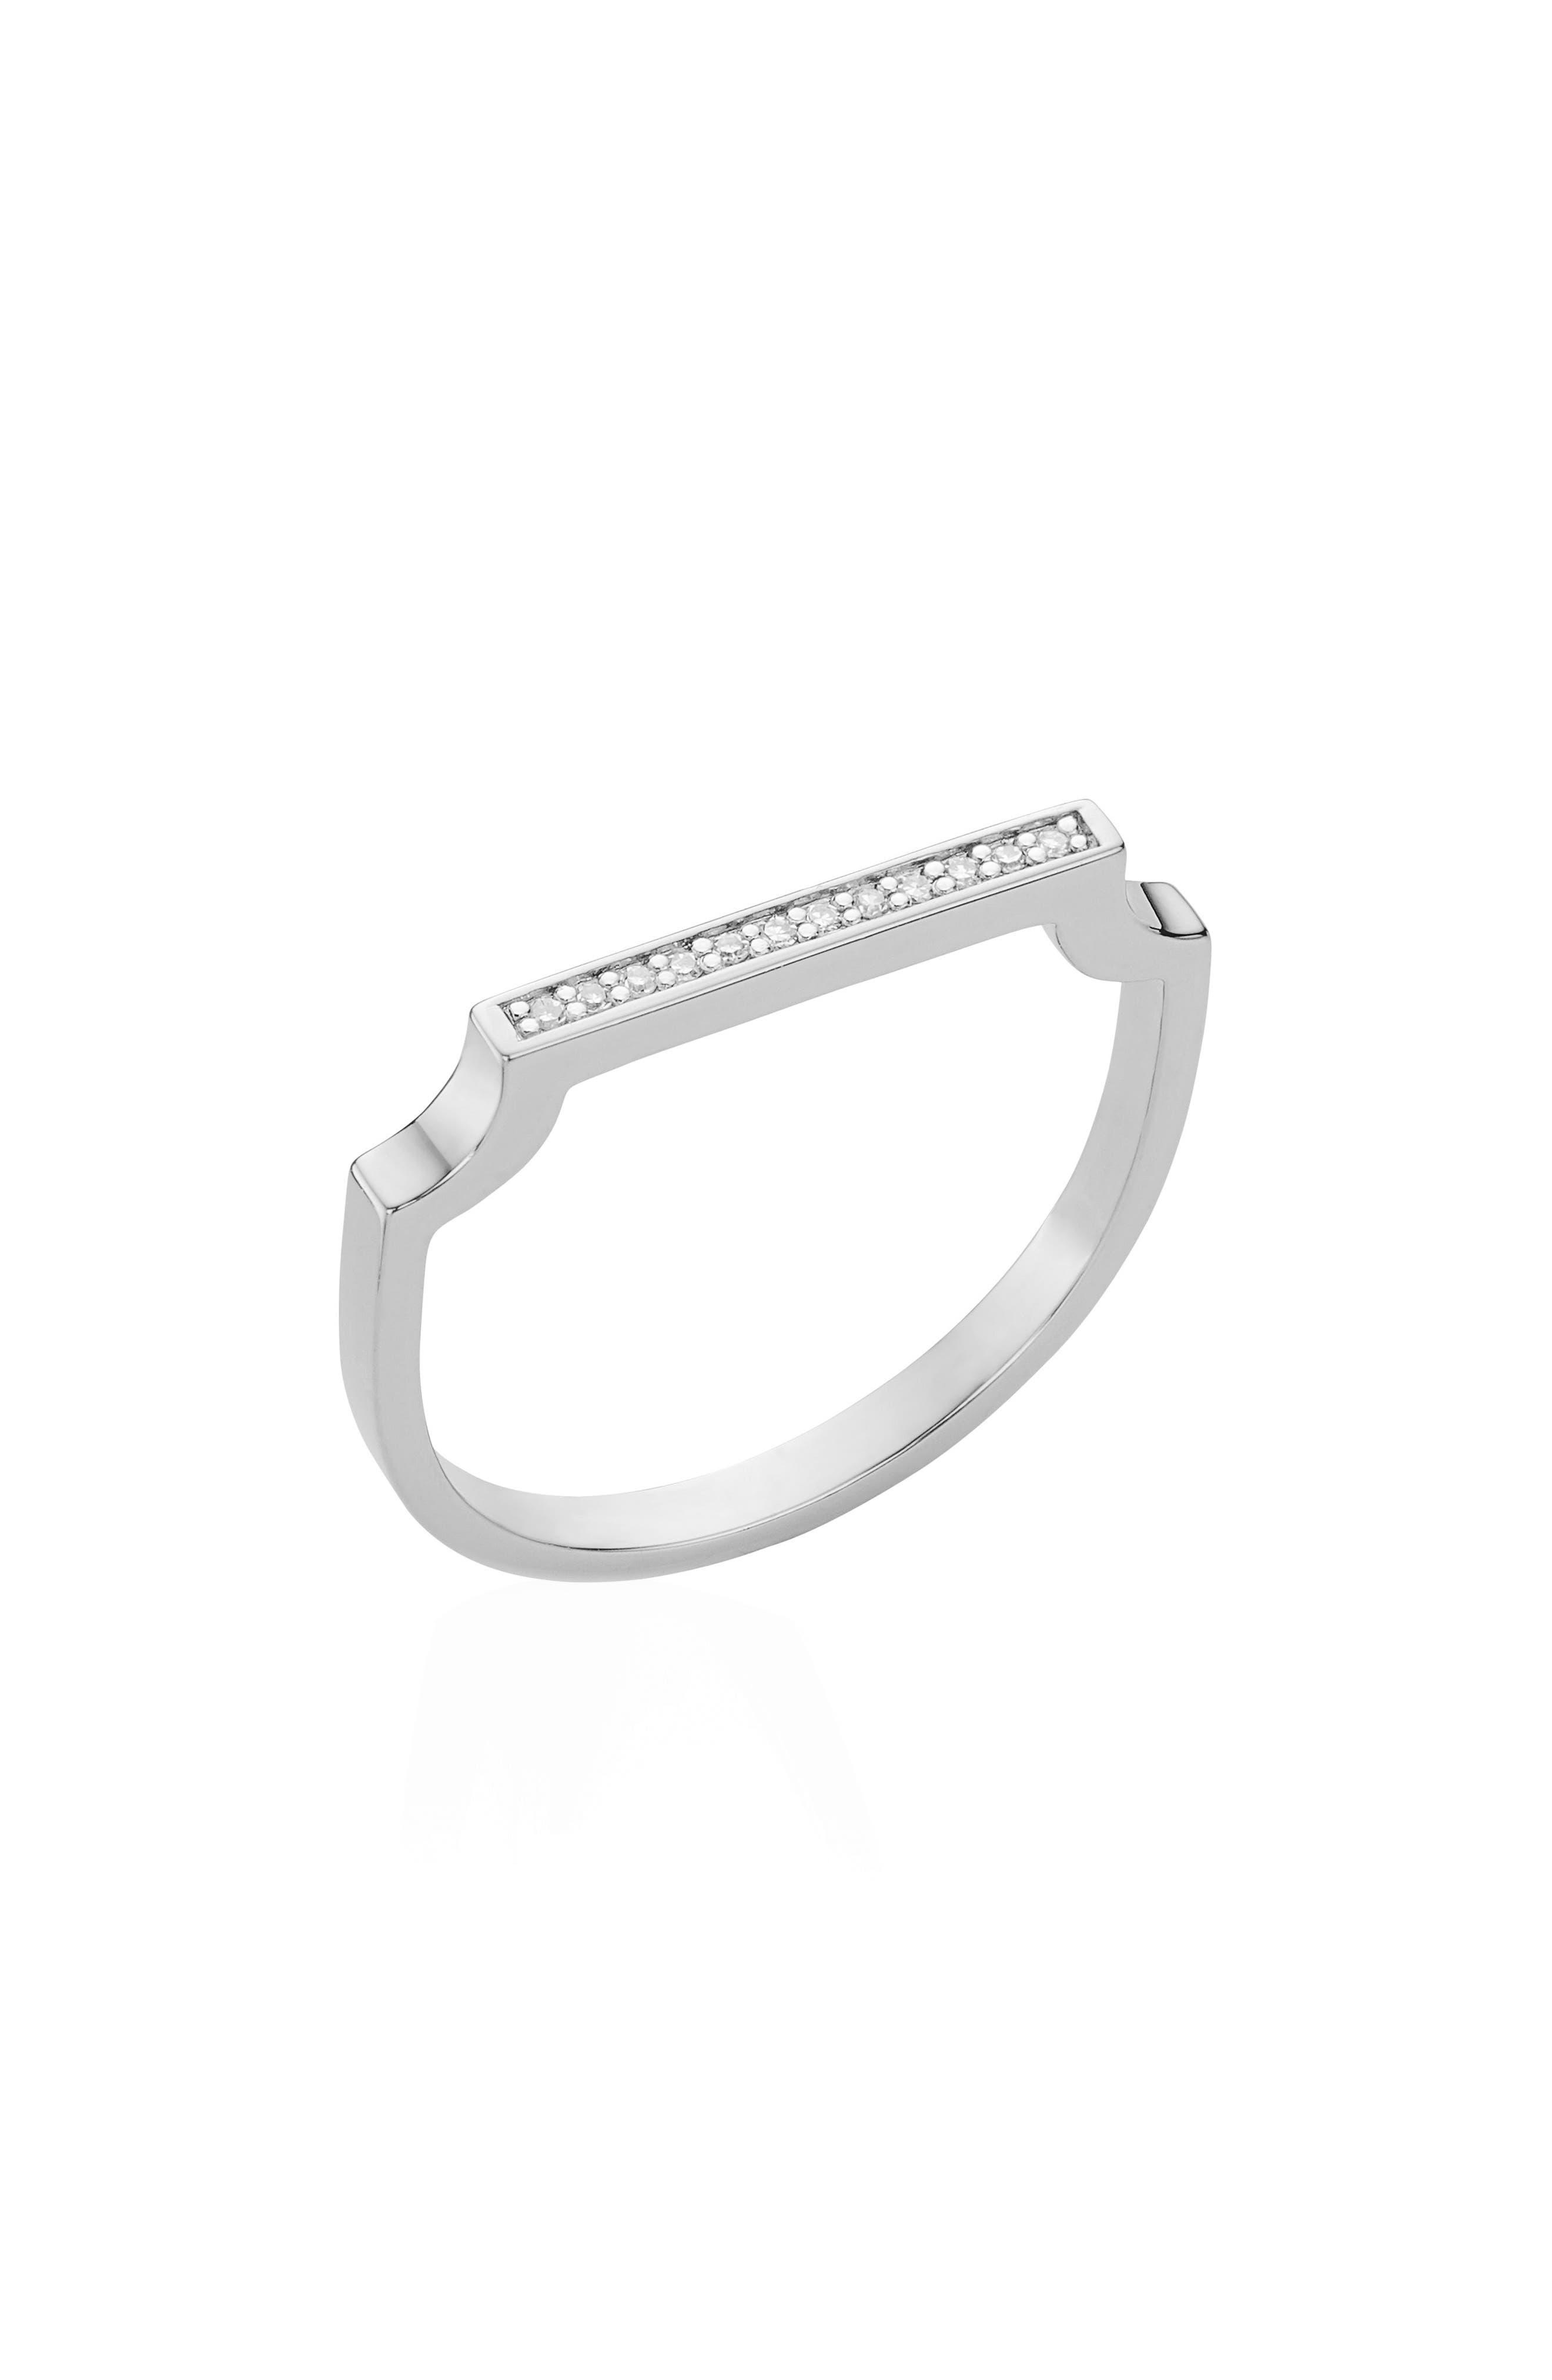 MONICA VINADER Signature Thin Diamond Ring, Main, color, SILVER/ DIAMOND